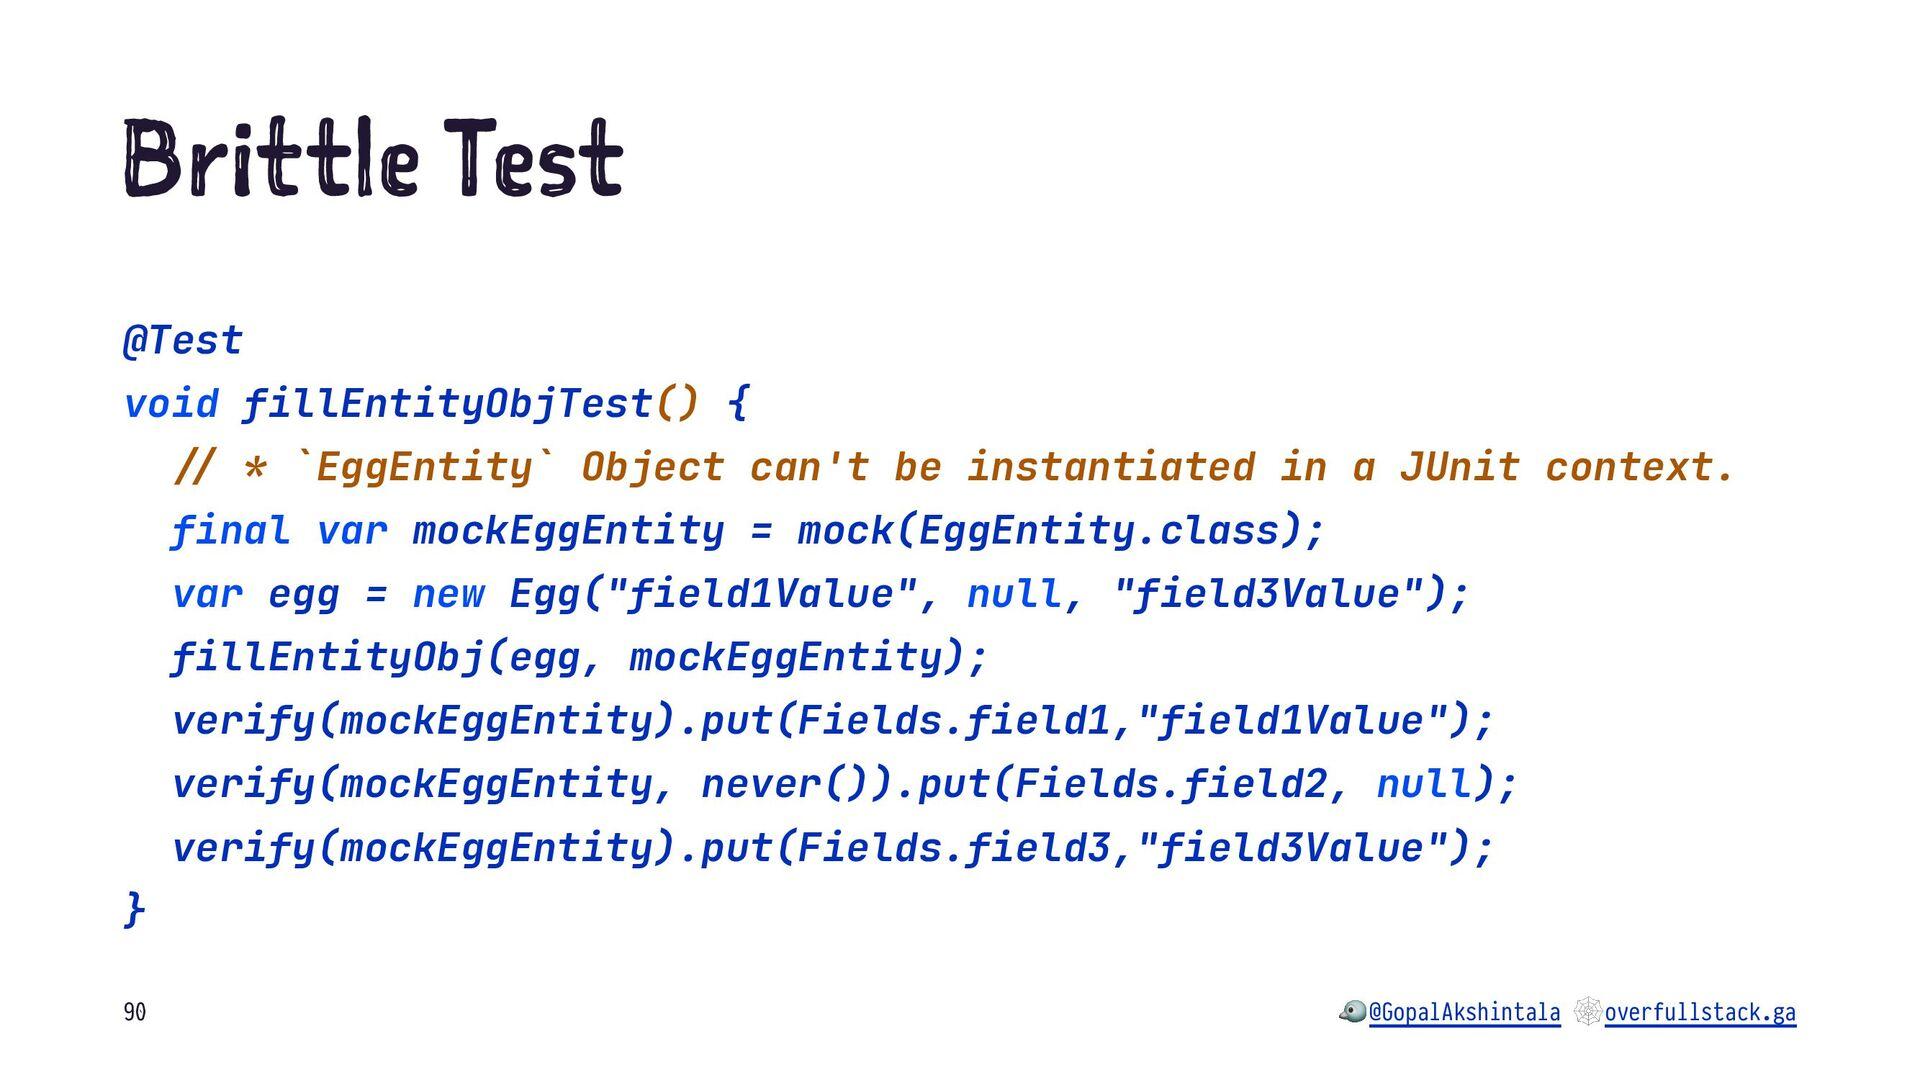 "B it le es @Test void fillEntityObjTest() { !"" ..."